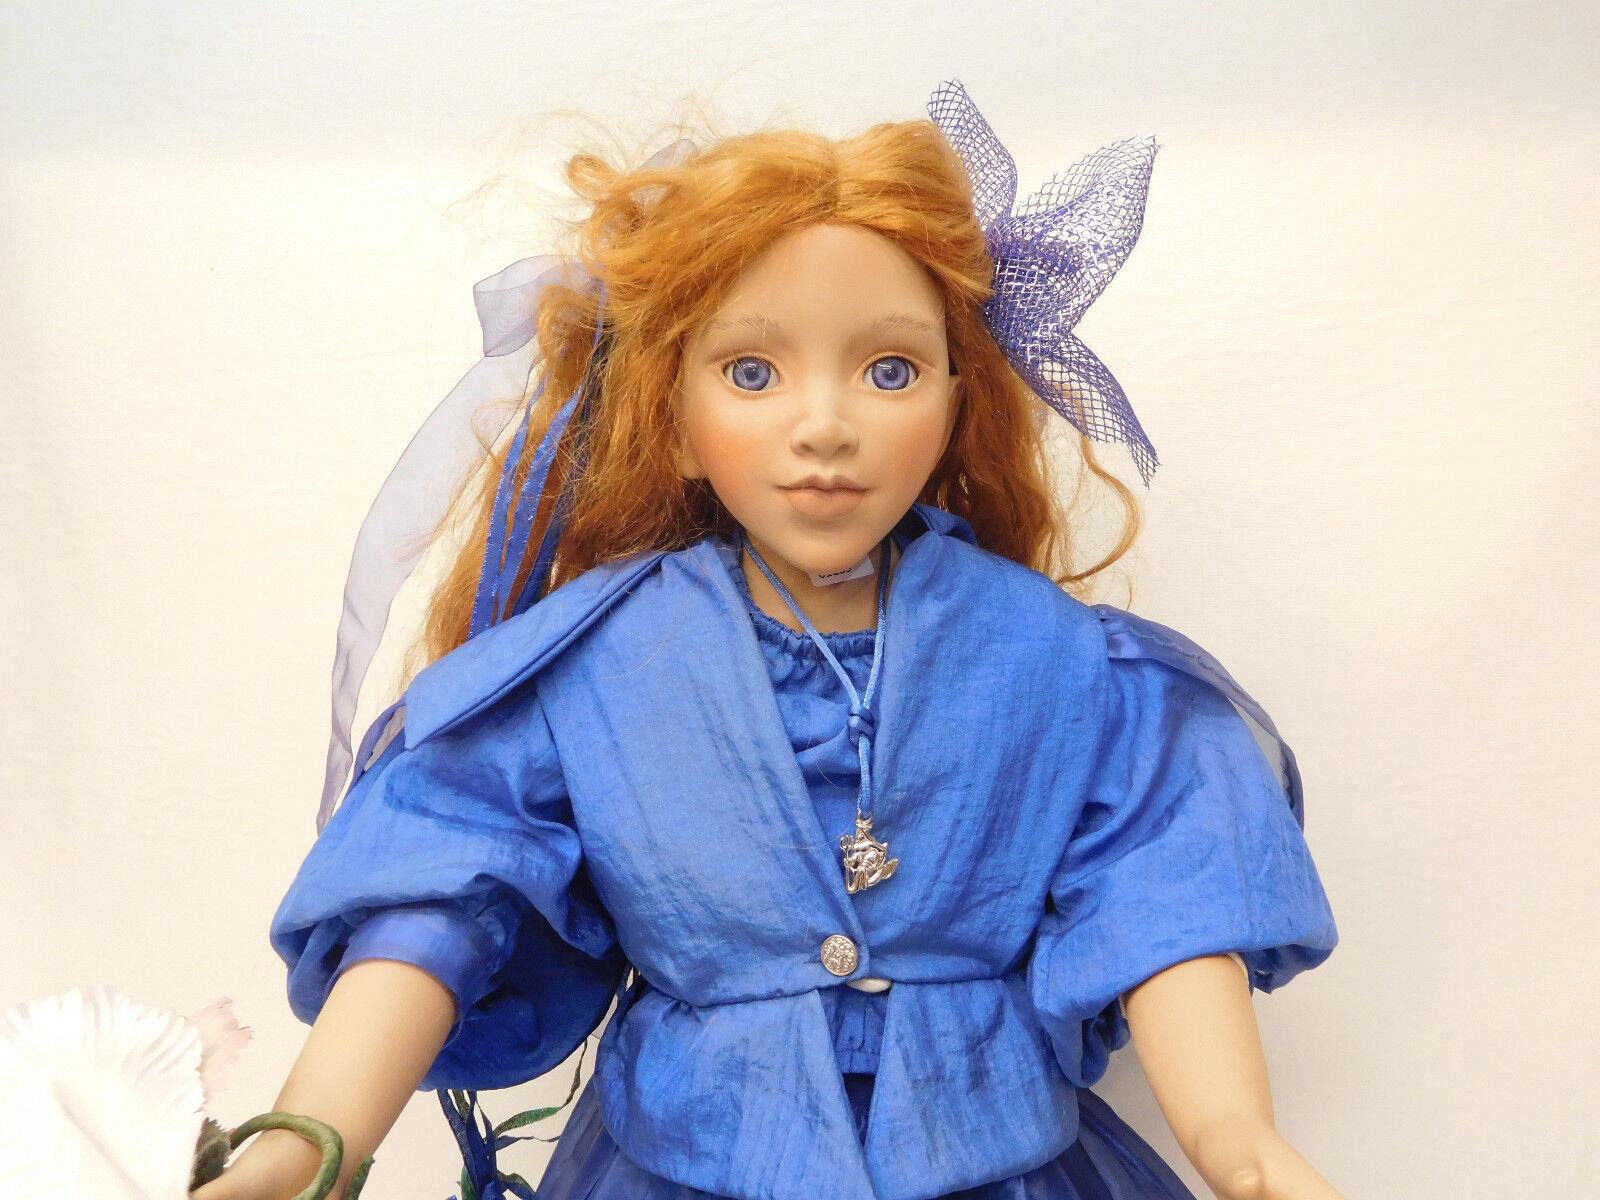 Mes-61283 ESI artisti bambola di größle-Schmidt Stella caratteri ACQUA UOMO